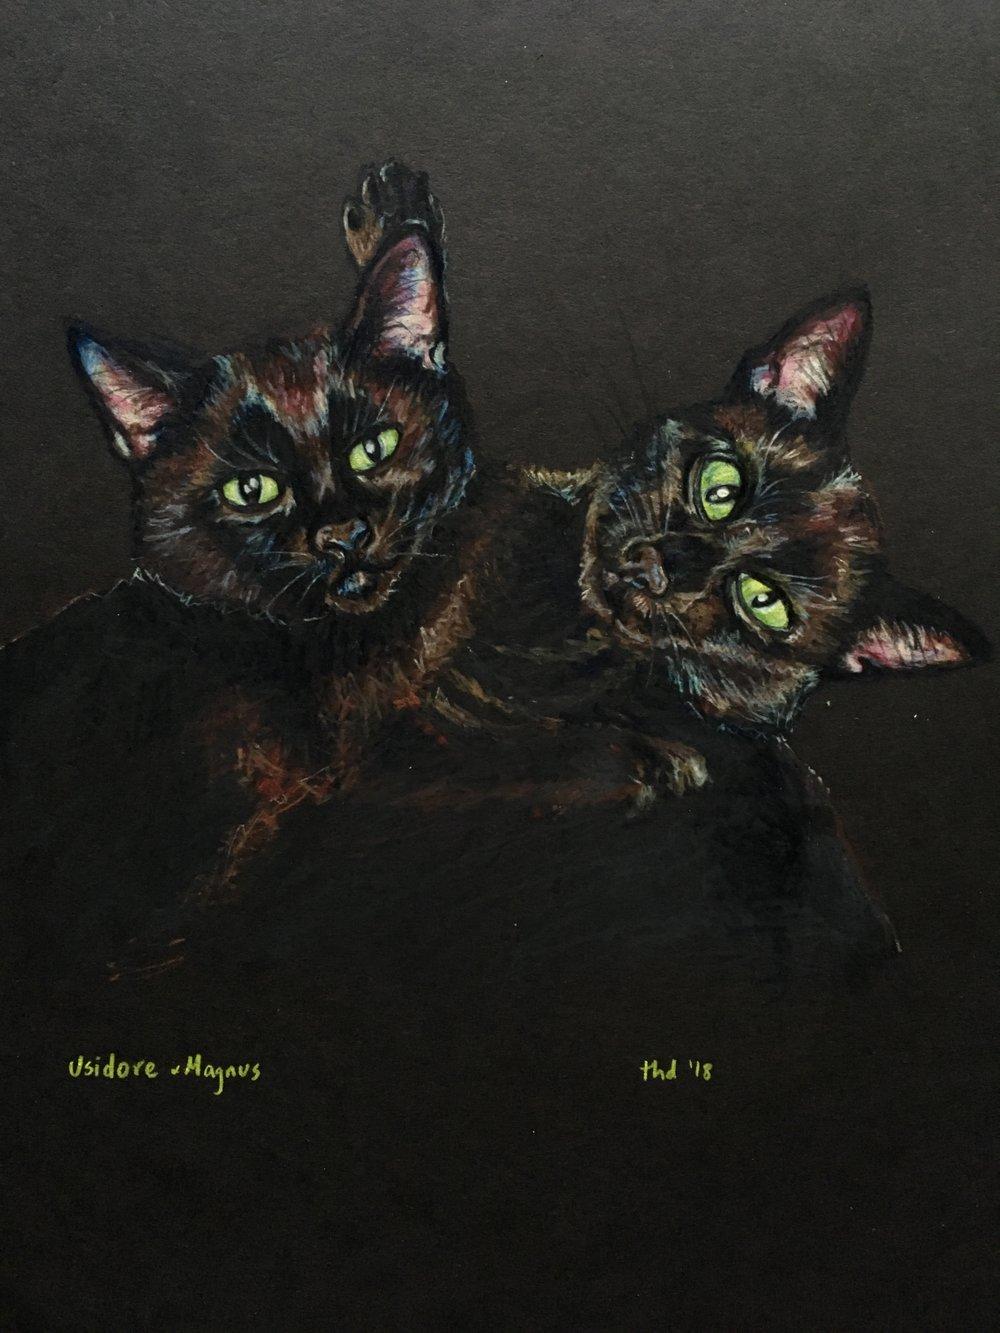 Usidore and Magnus